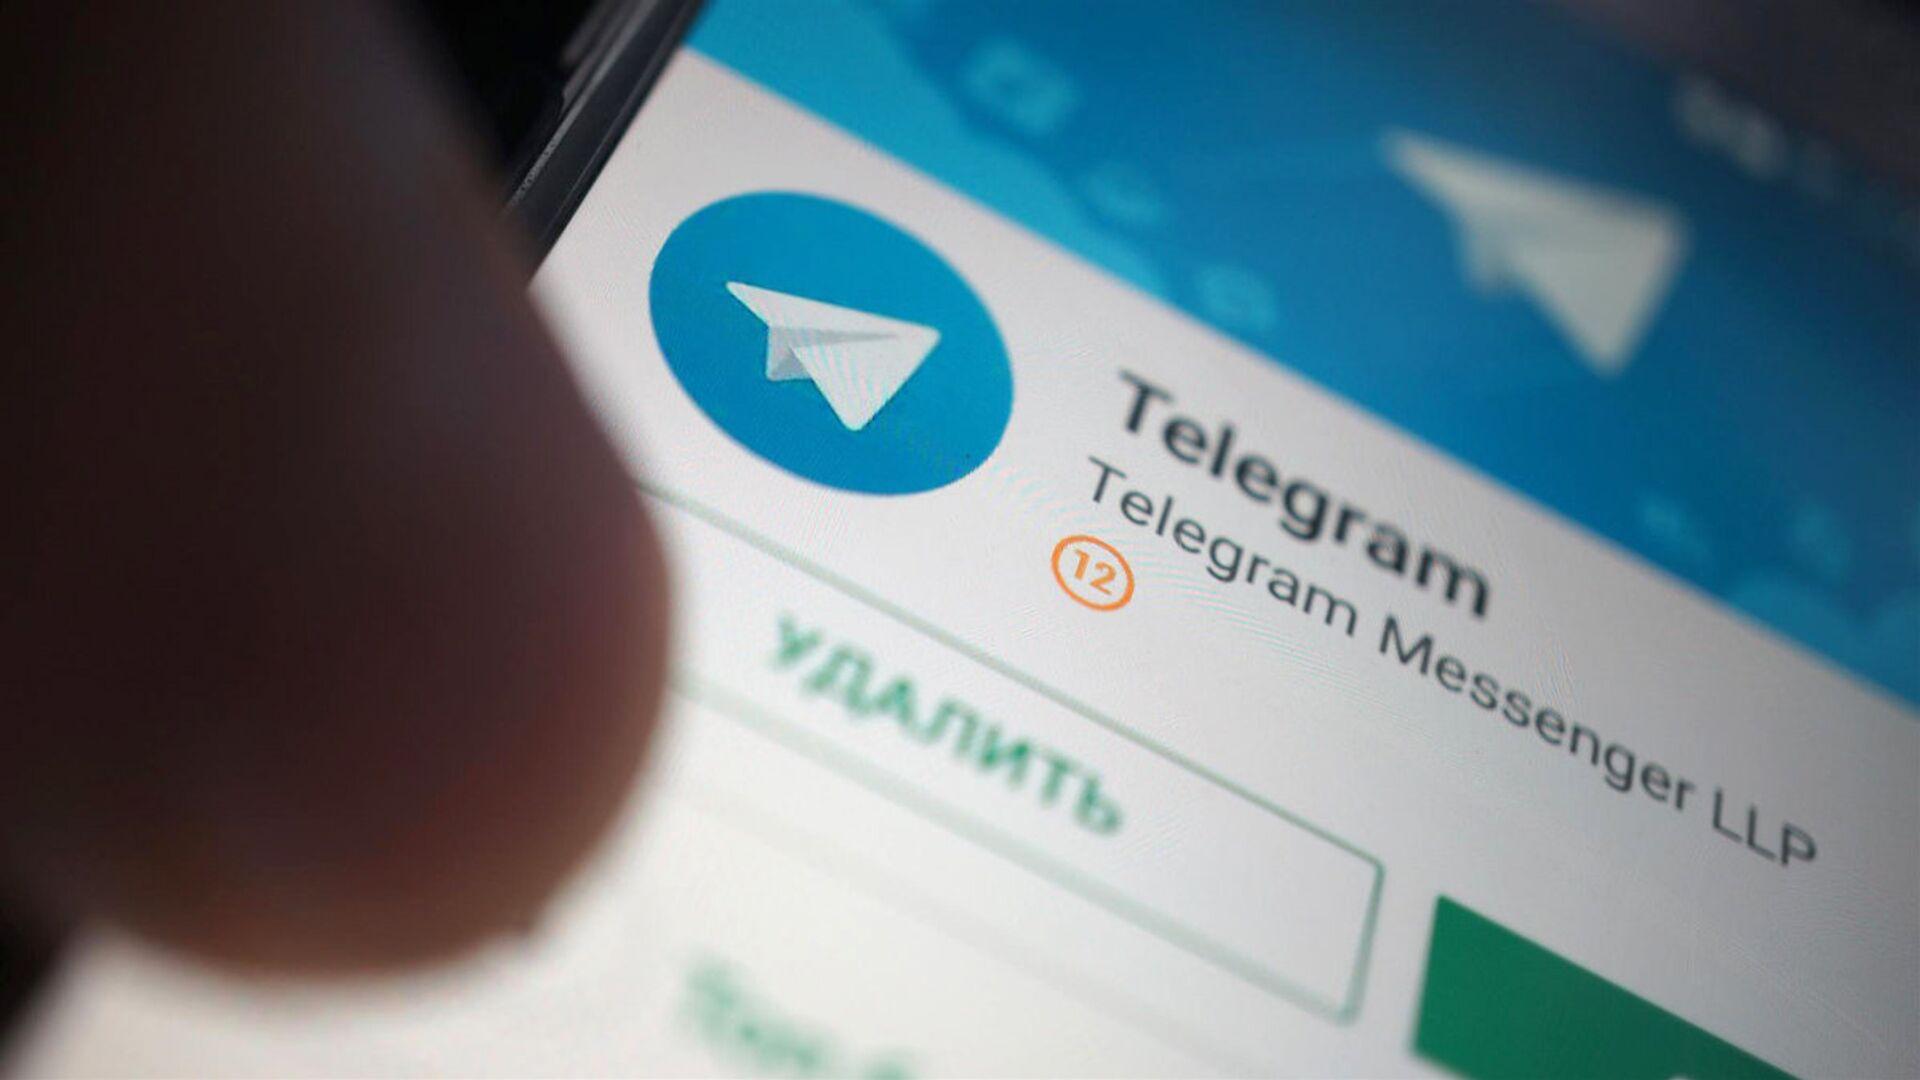 Логотип мессенджера Telegram - РИА Новости, 1920, 01.09.2021